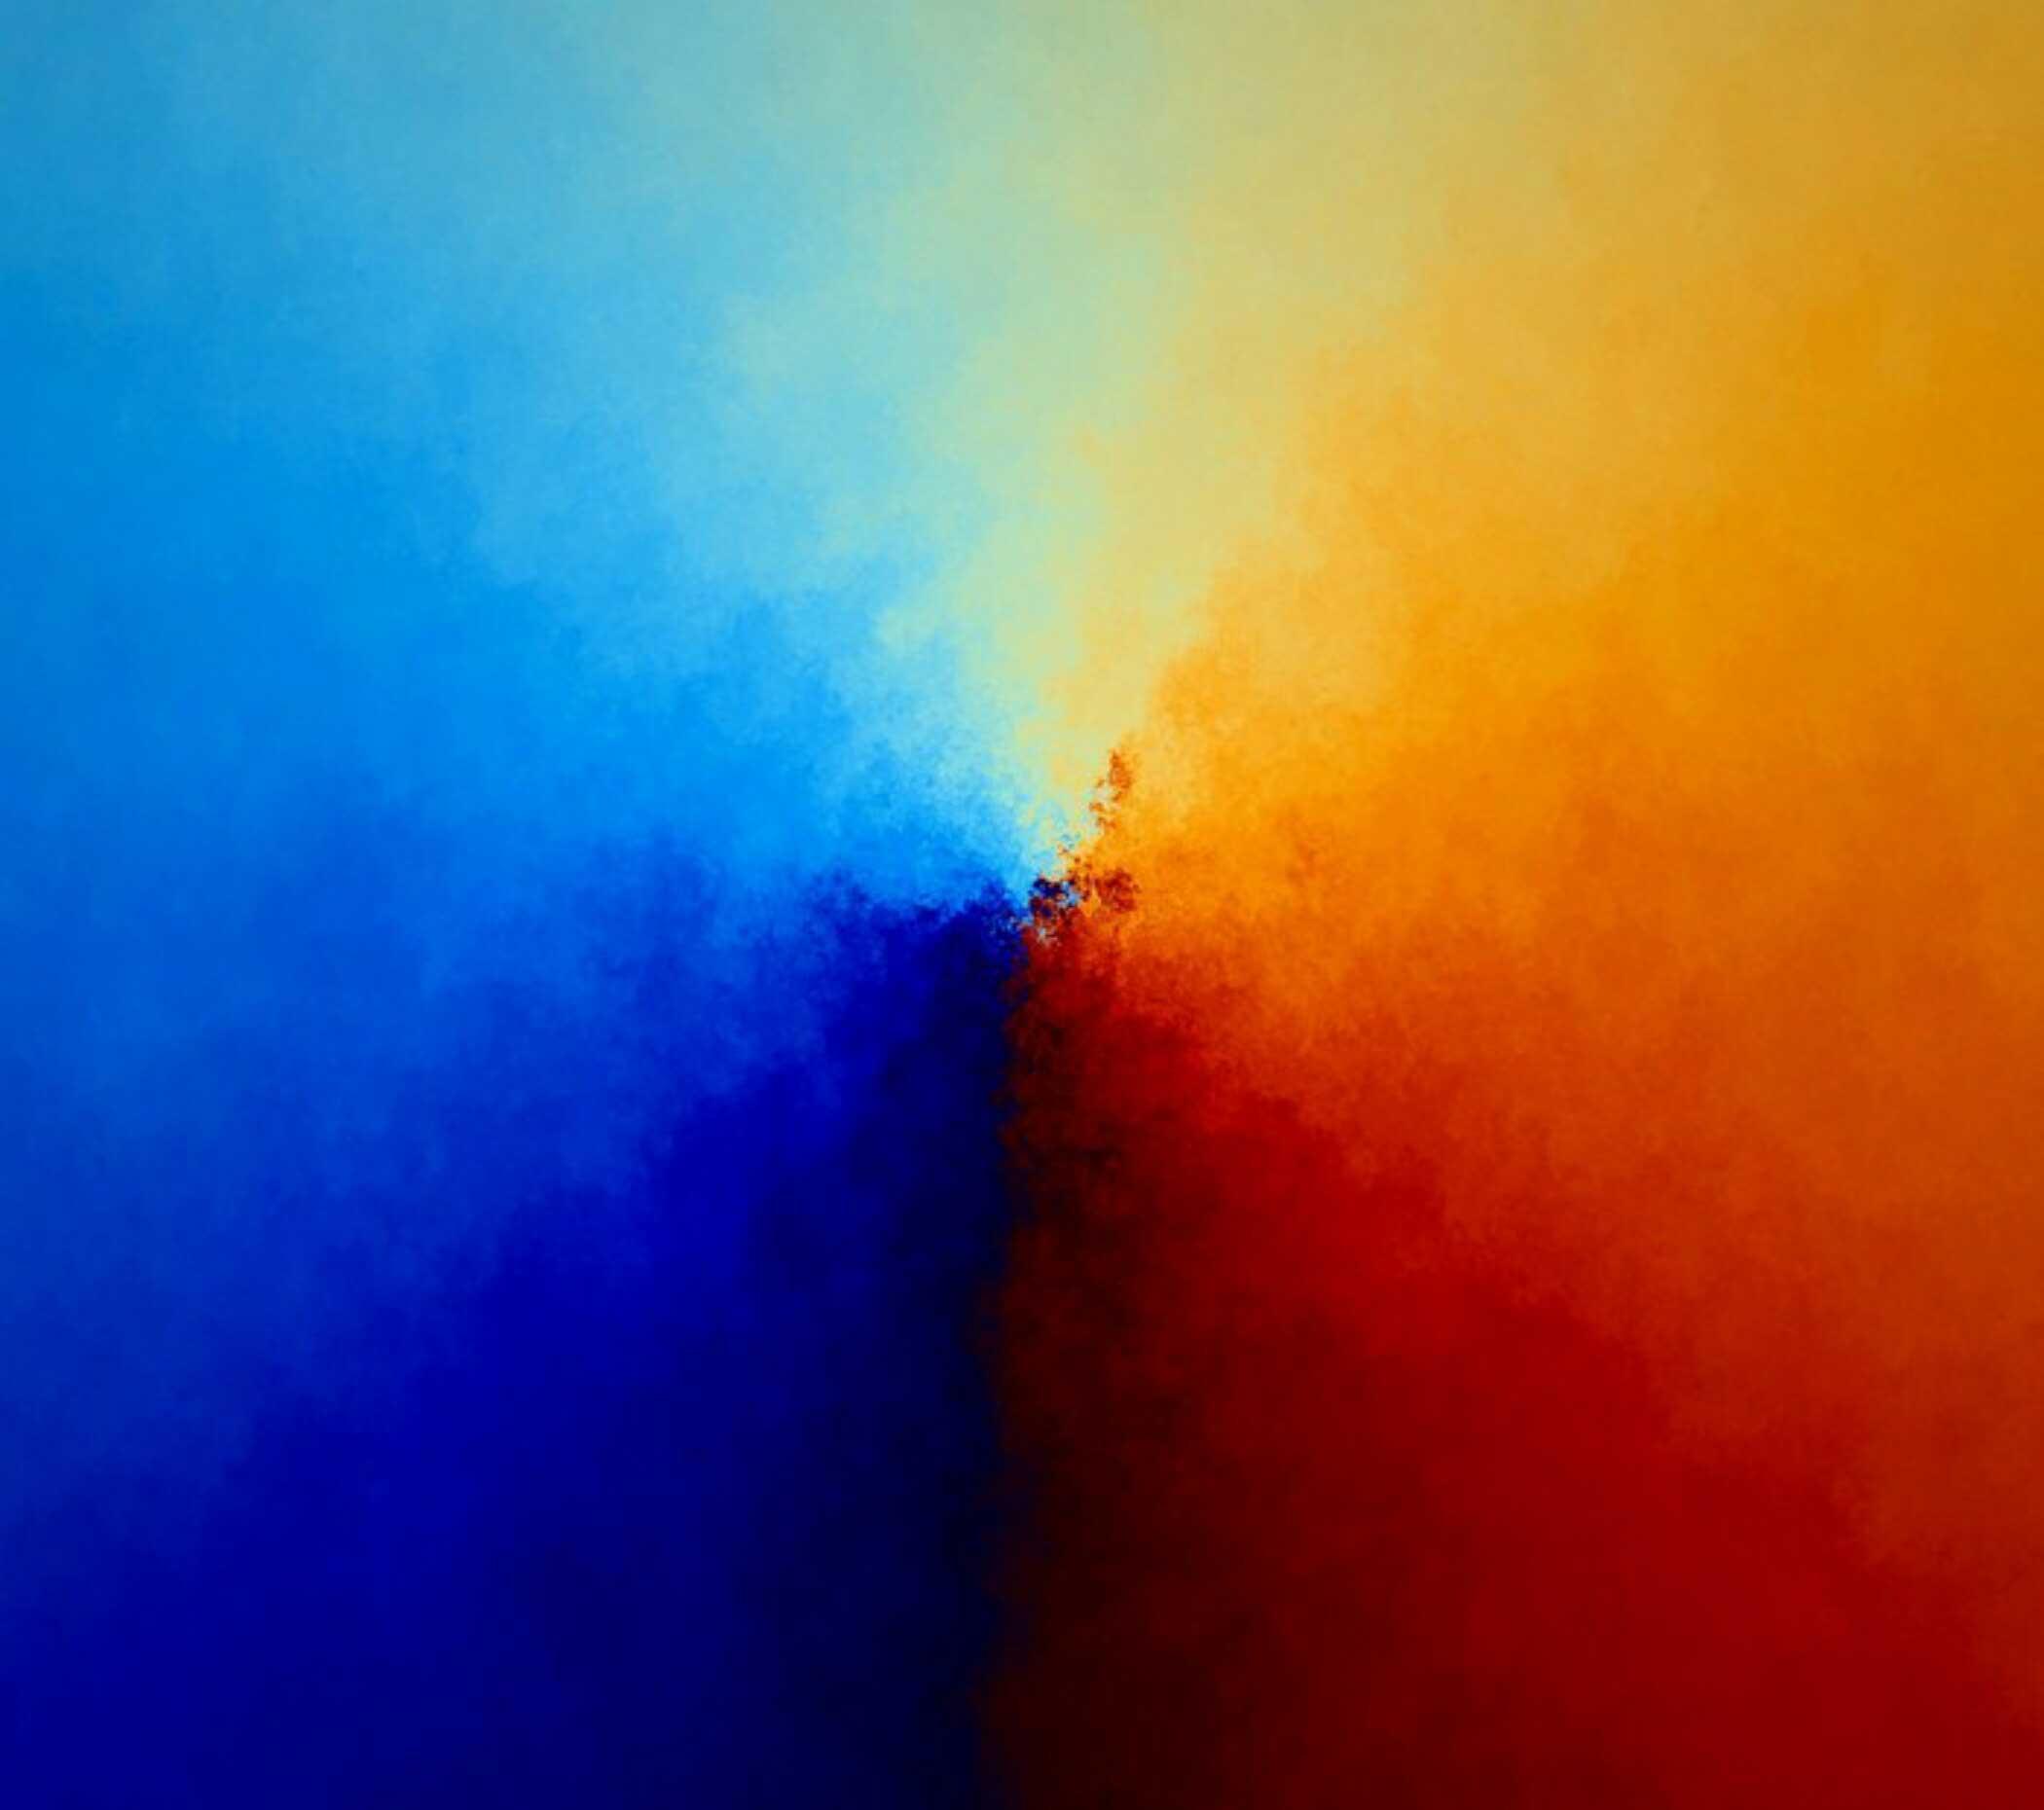 Wallpaper Smartphone 1080p 1080p Wallpapers 2100x1860